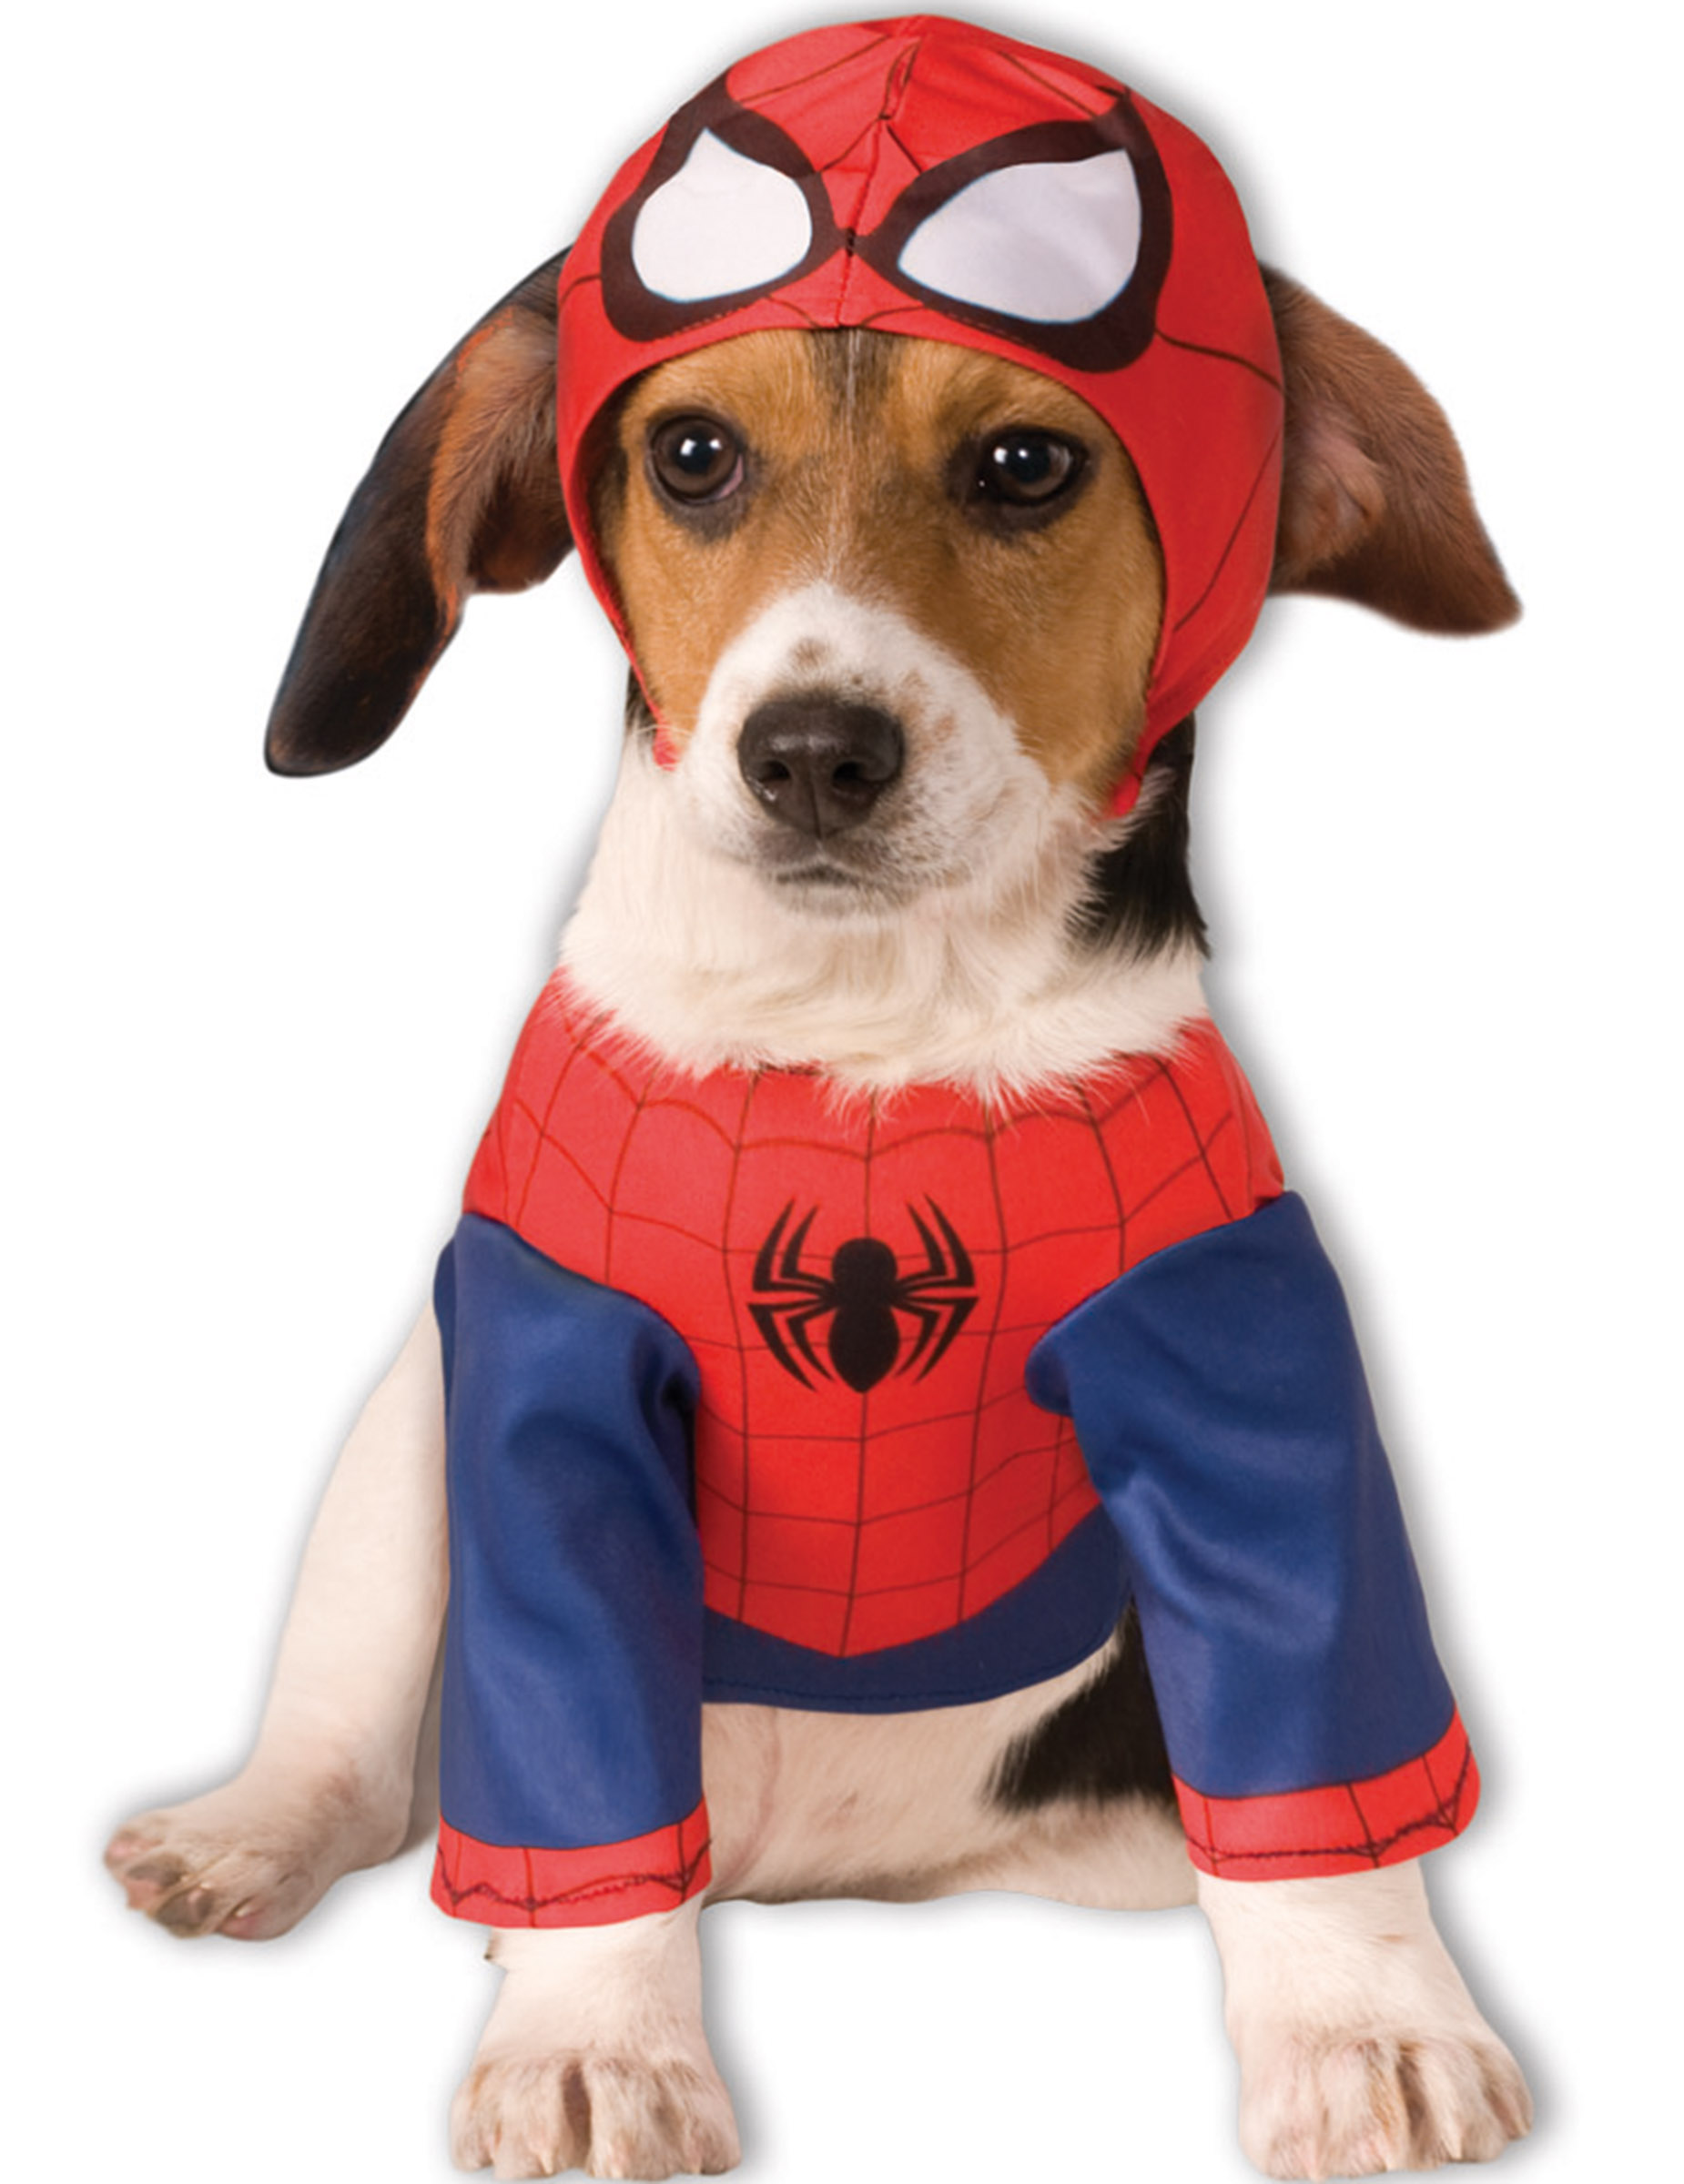 spiderman kost m f r hunde accessoires und g nstige faschingskost me vegaoo. Black Bedroom Furniture Sets. Home Design Ideas